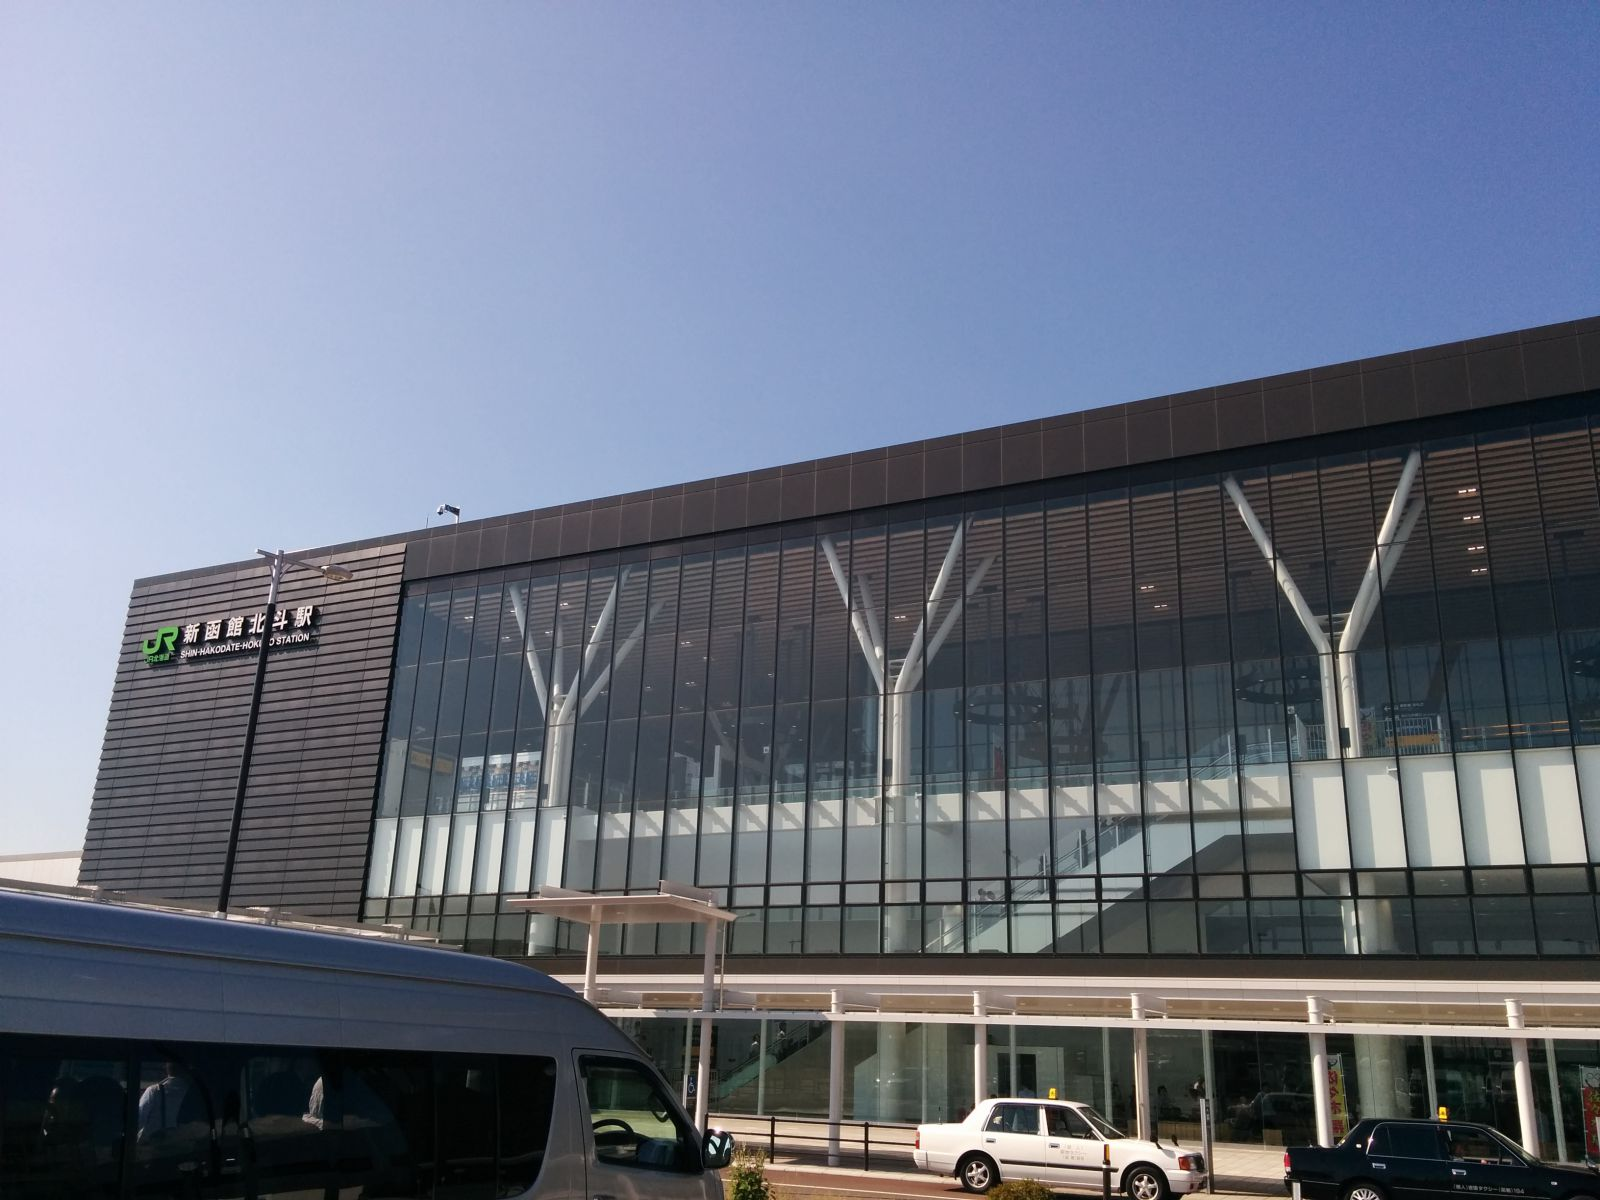 【新函館北斗駅】新函館北斗駅観光写真です。